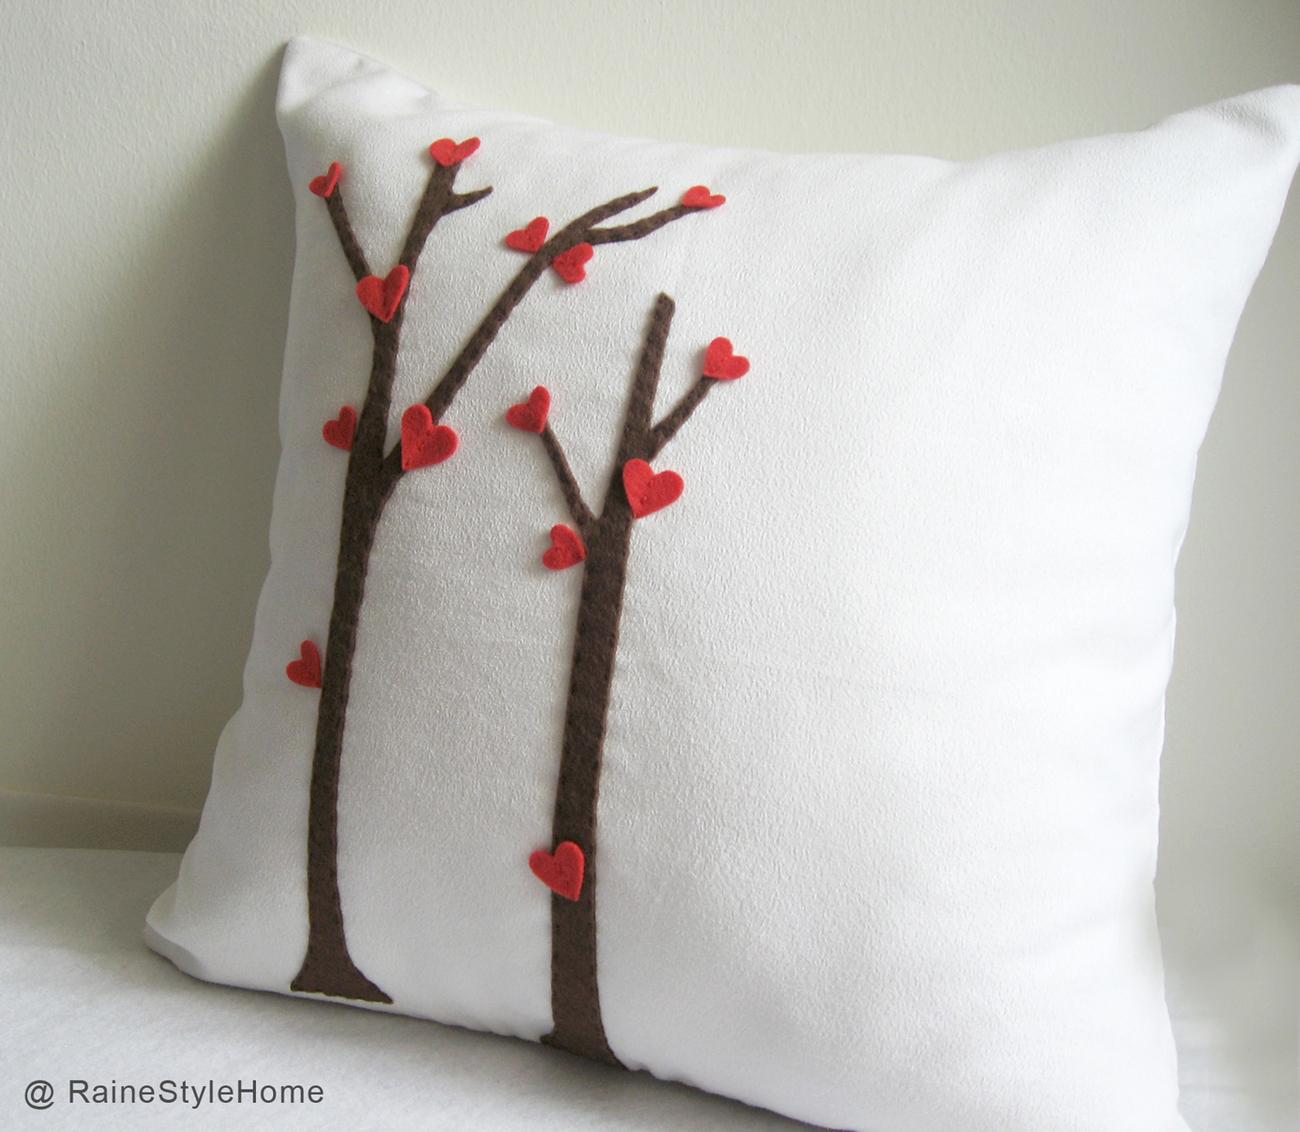 Valentine Gift. Love Trees Blossom White Pillow Cover. Decorative Cushion